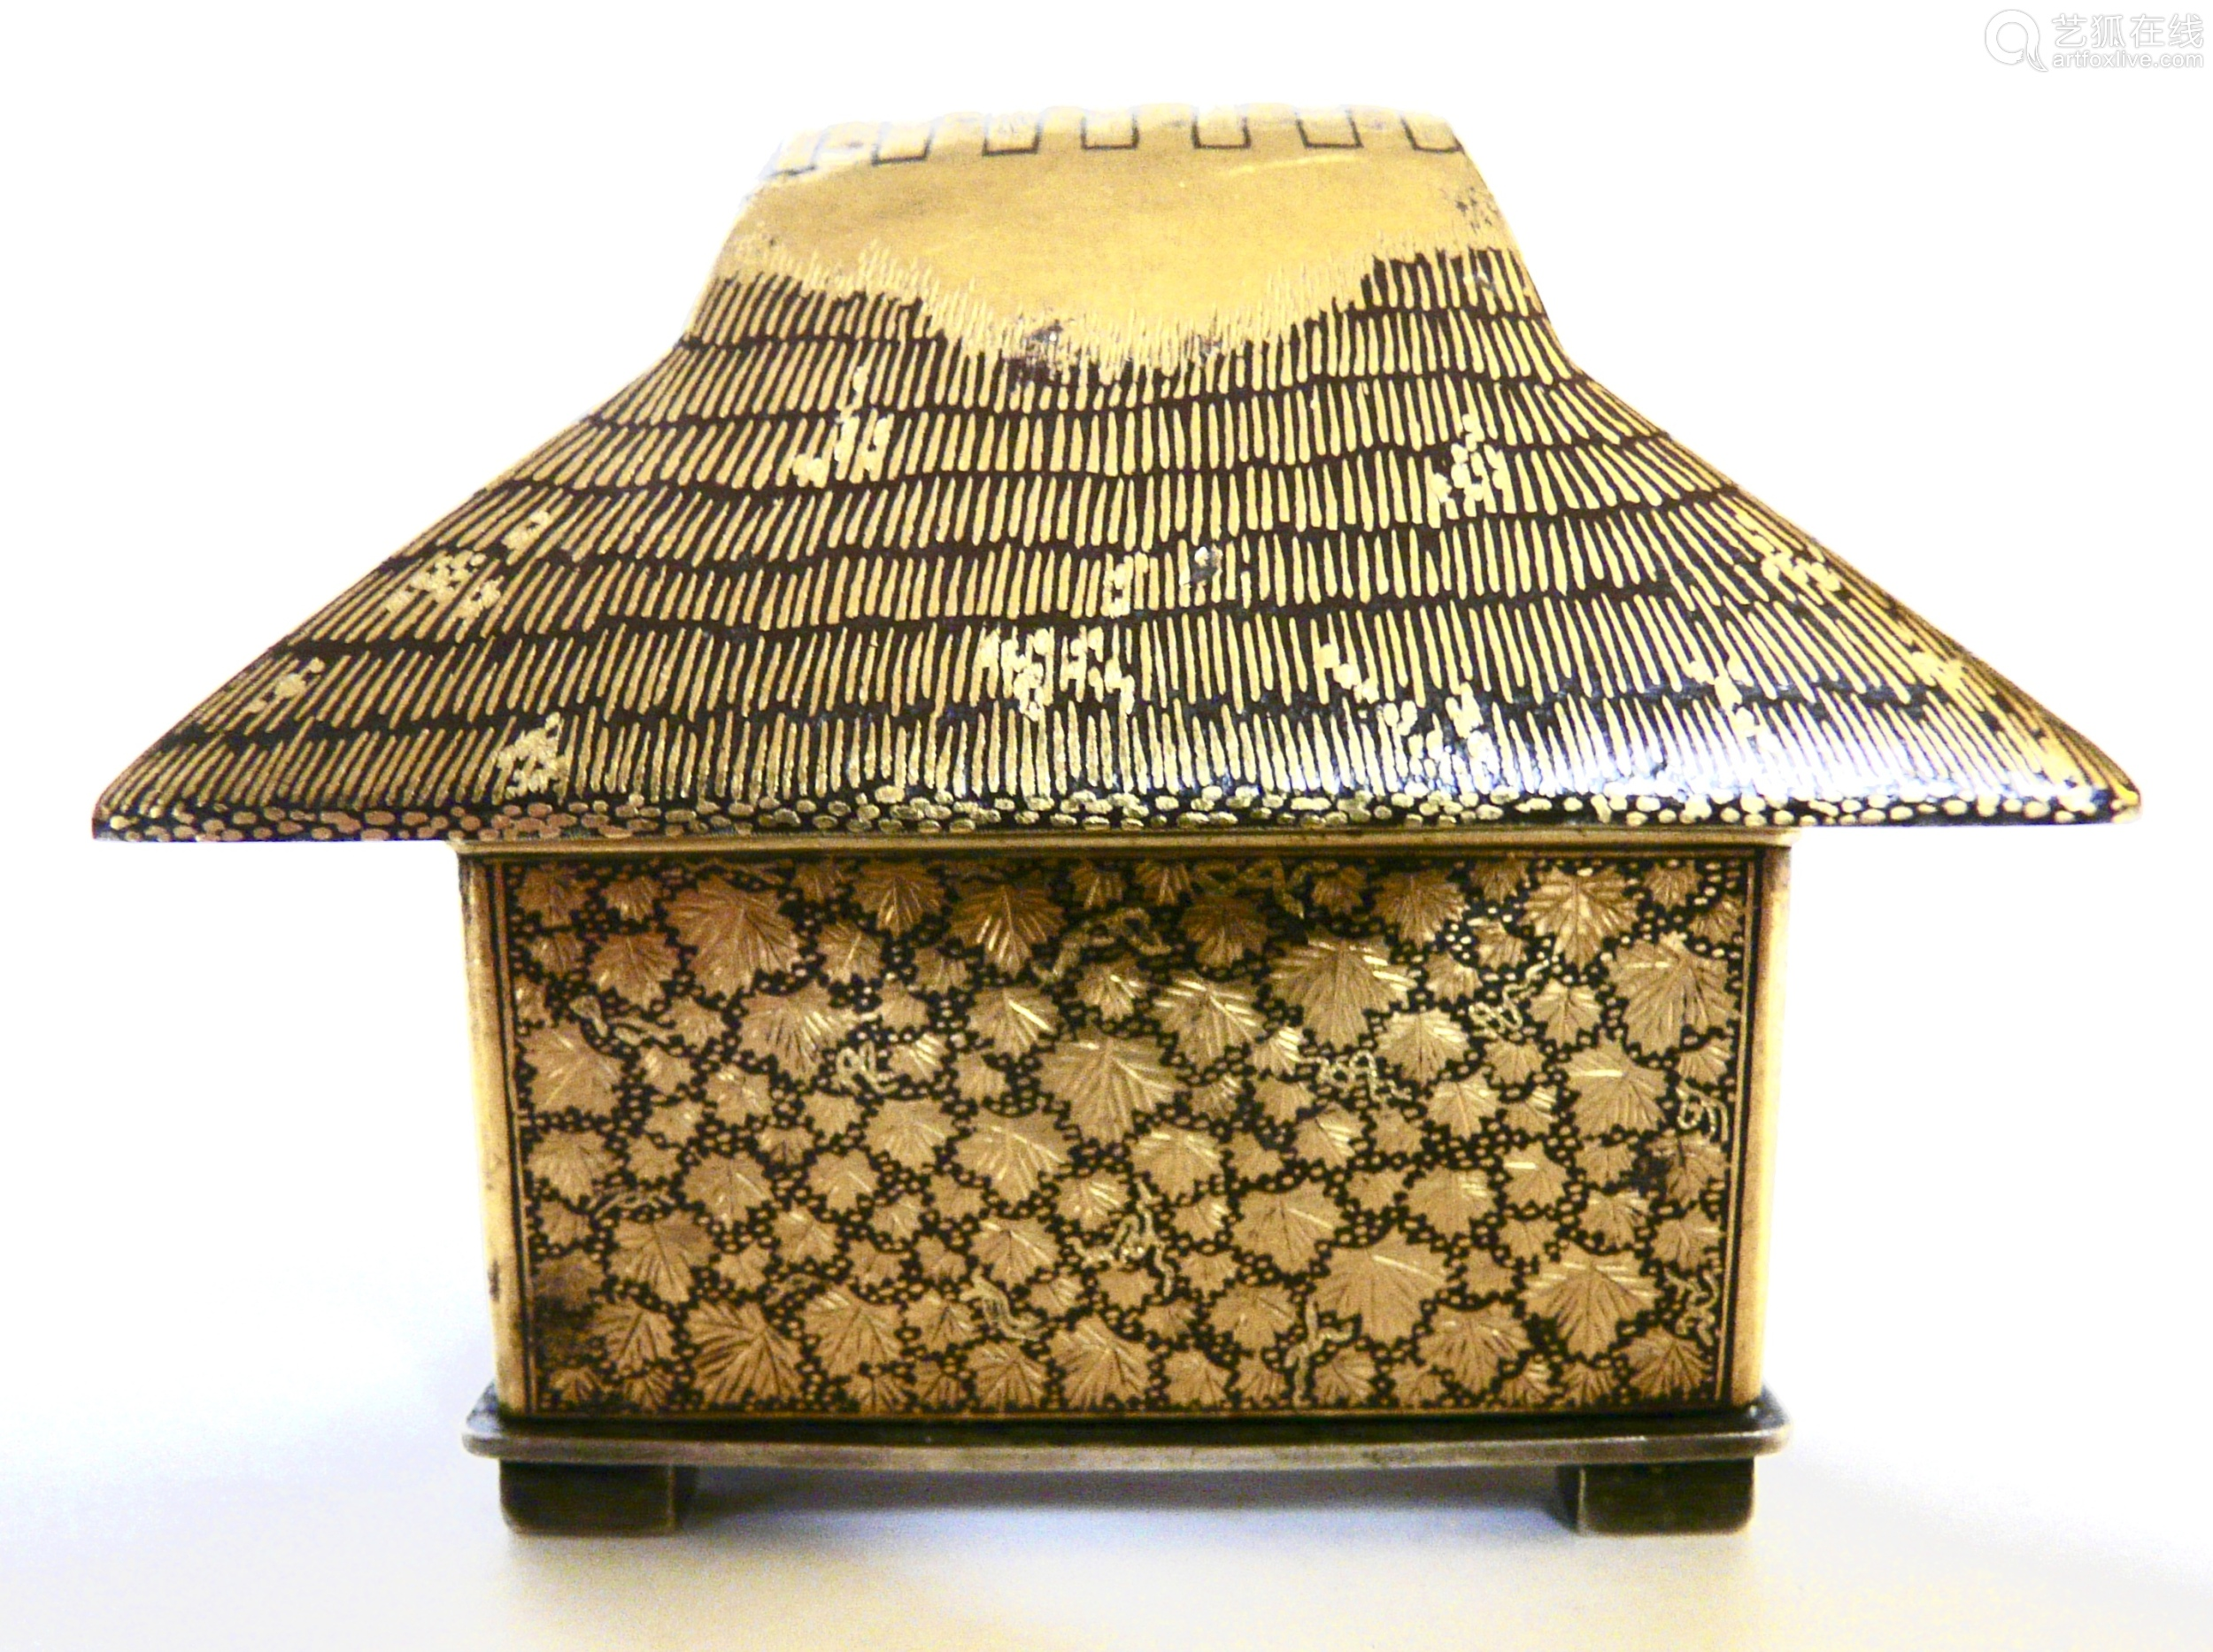 KOMAI, Japon, période Meiji, fin XIXe siècle.  Petite boite en fer et incrustations en nunomezogan or